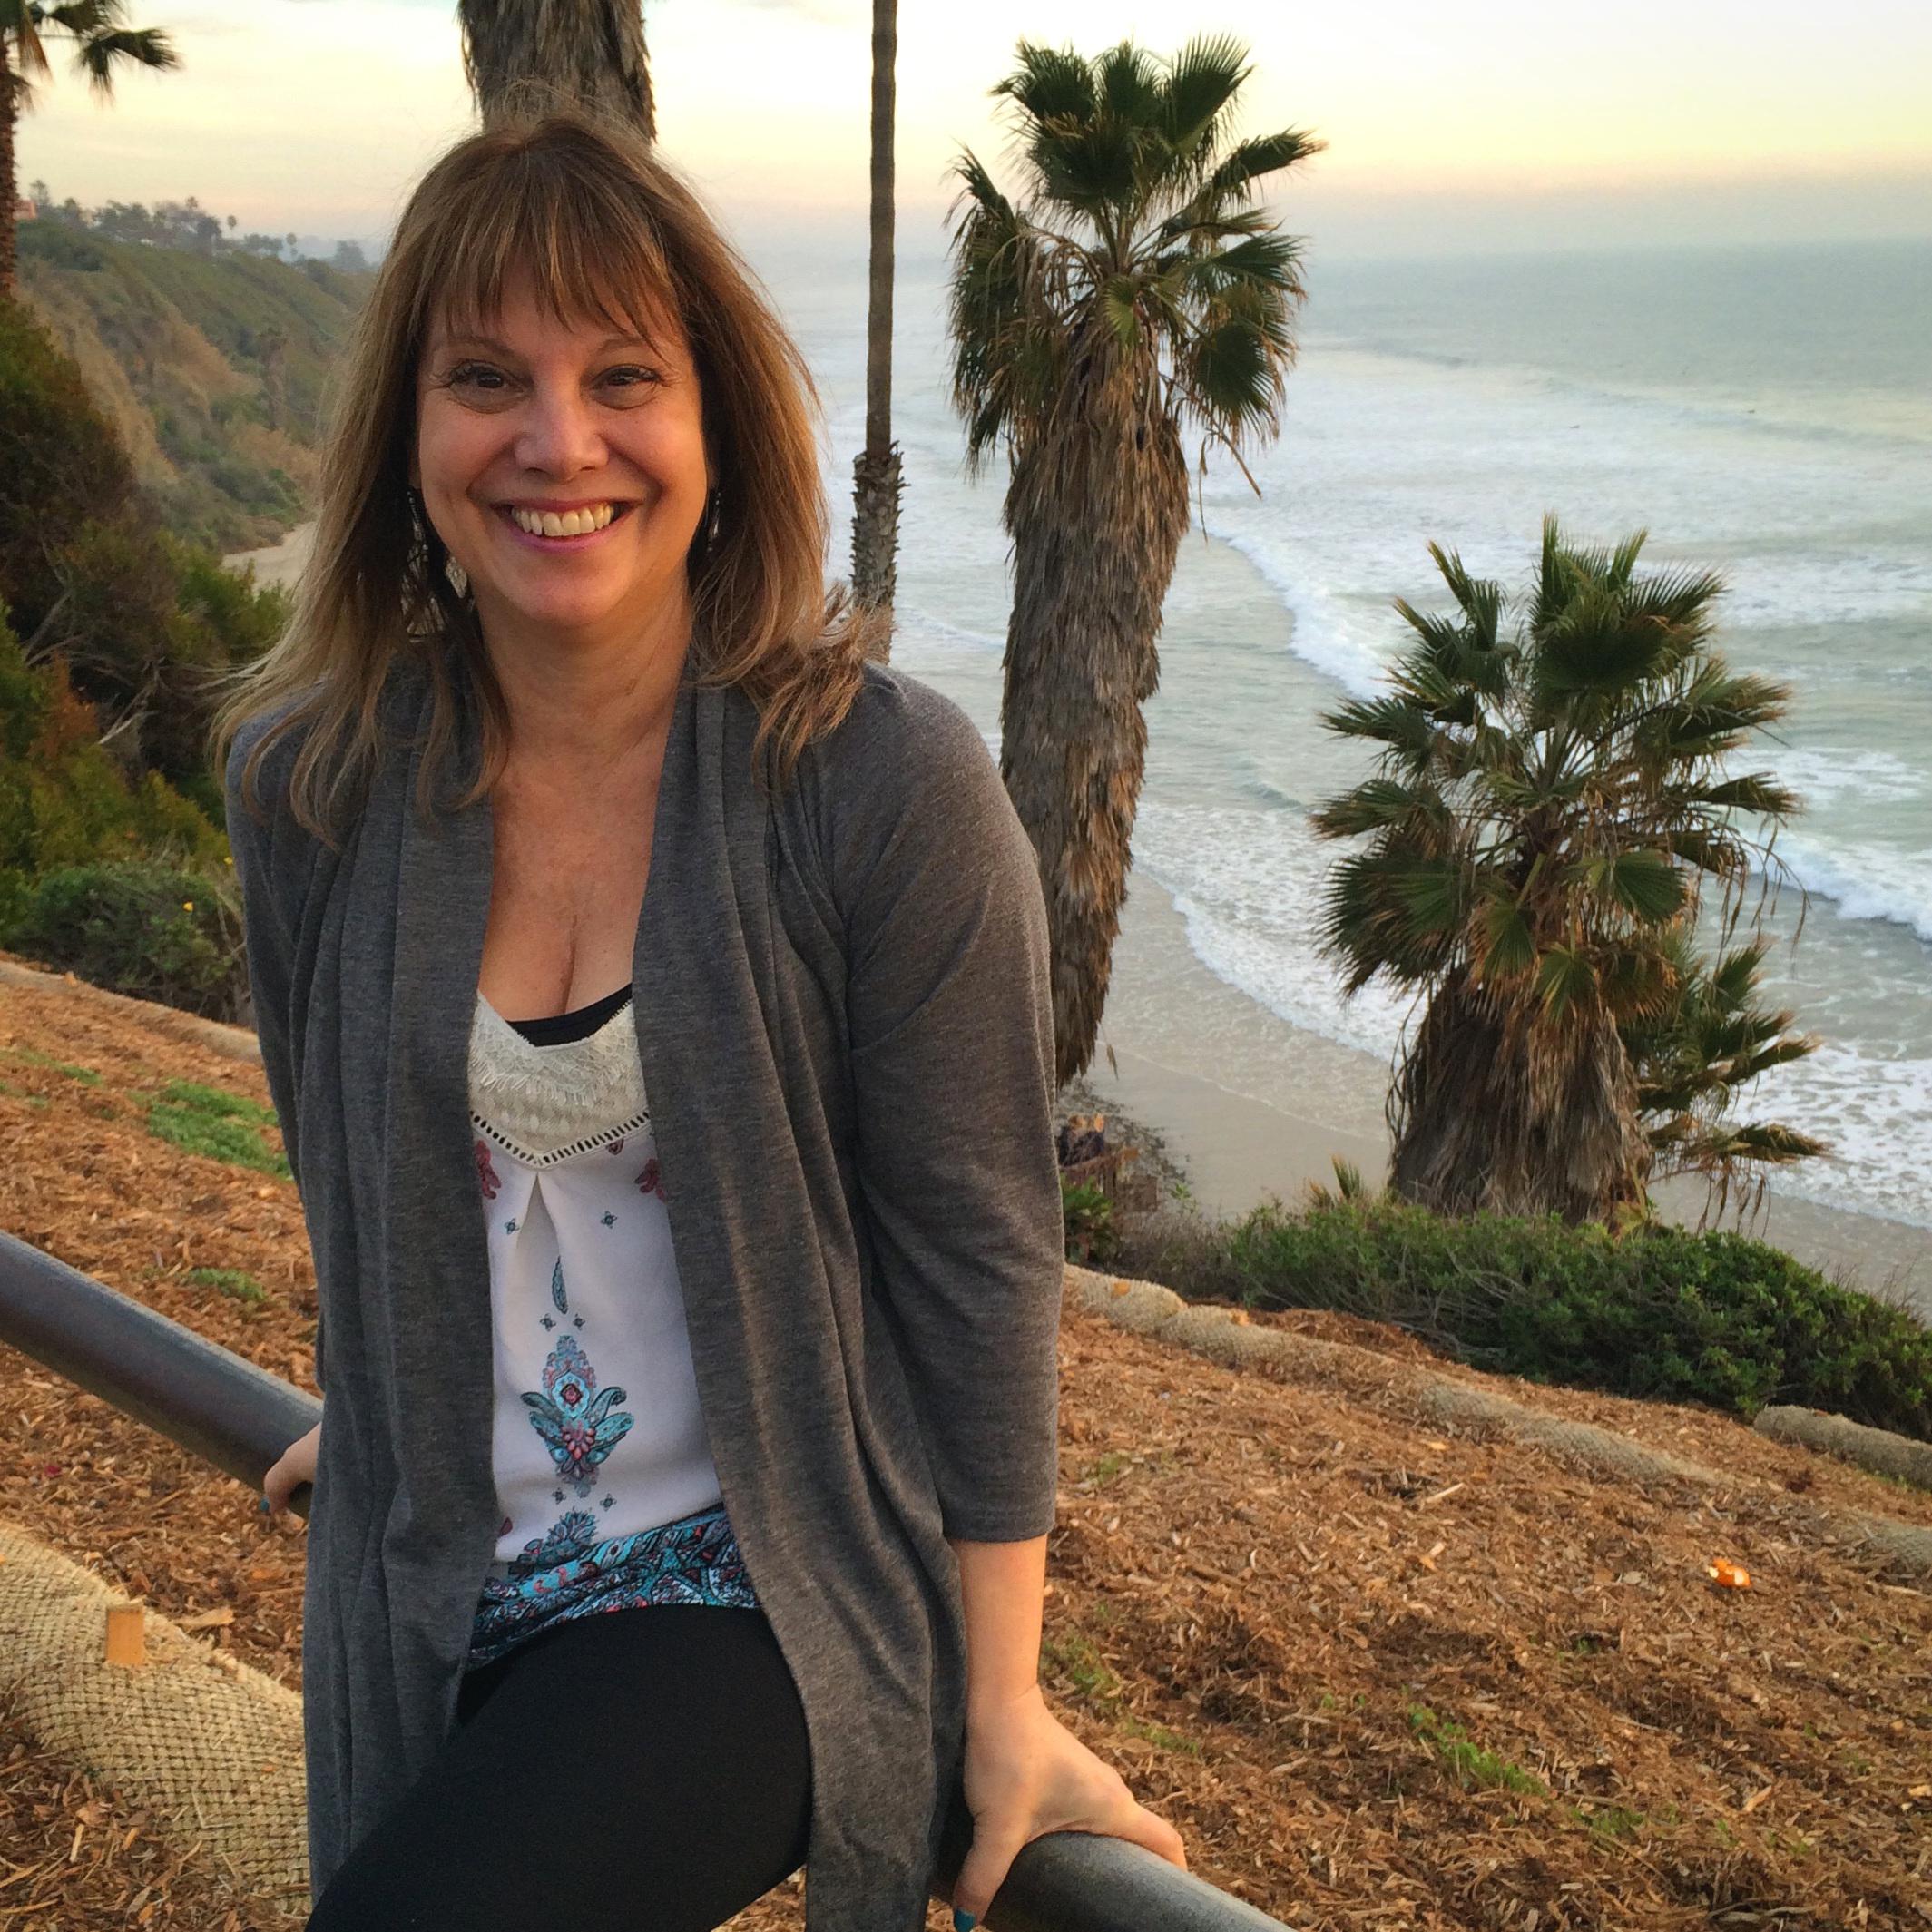 Patti Rose - Self-exploration Specialist, Journal Contributor (Jenni's mom!)